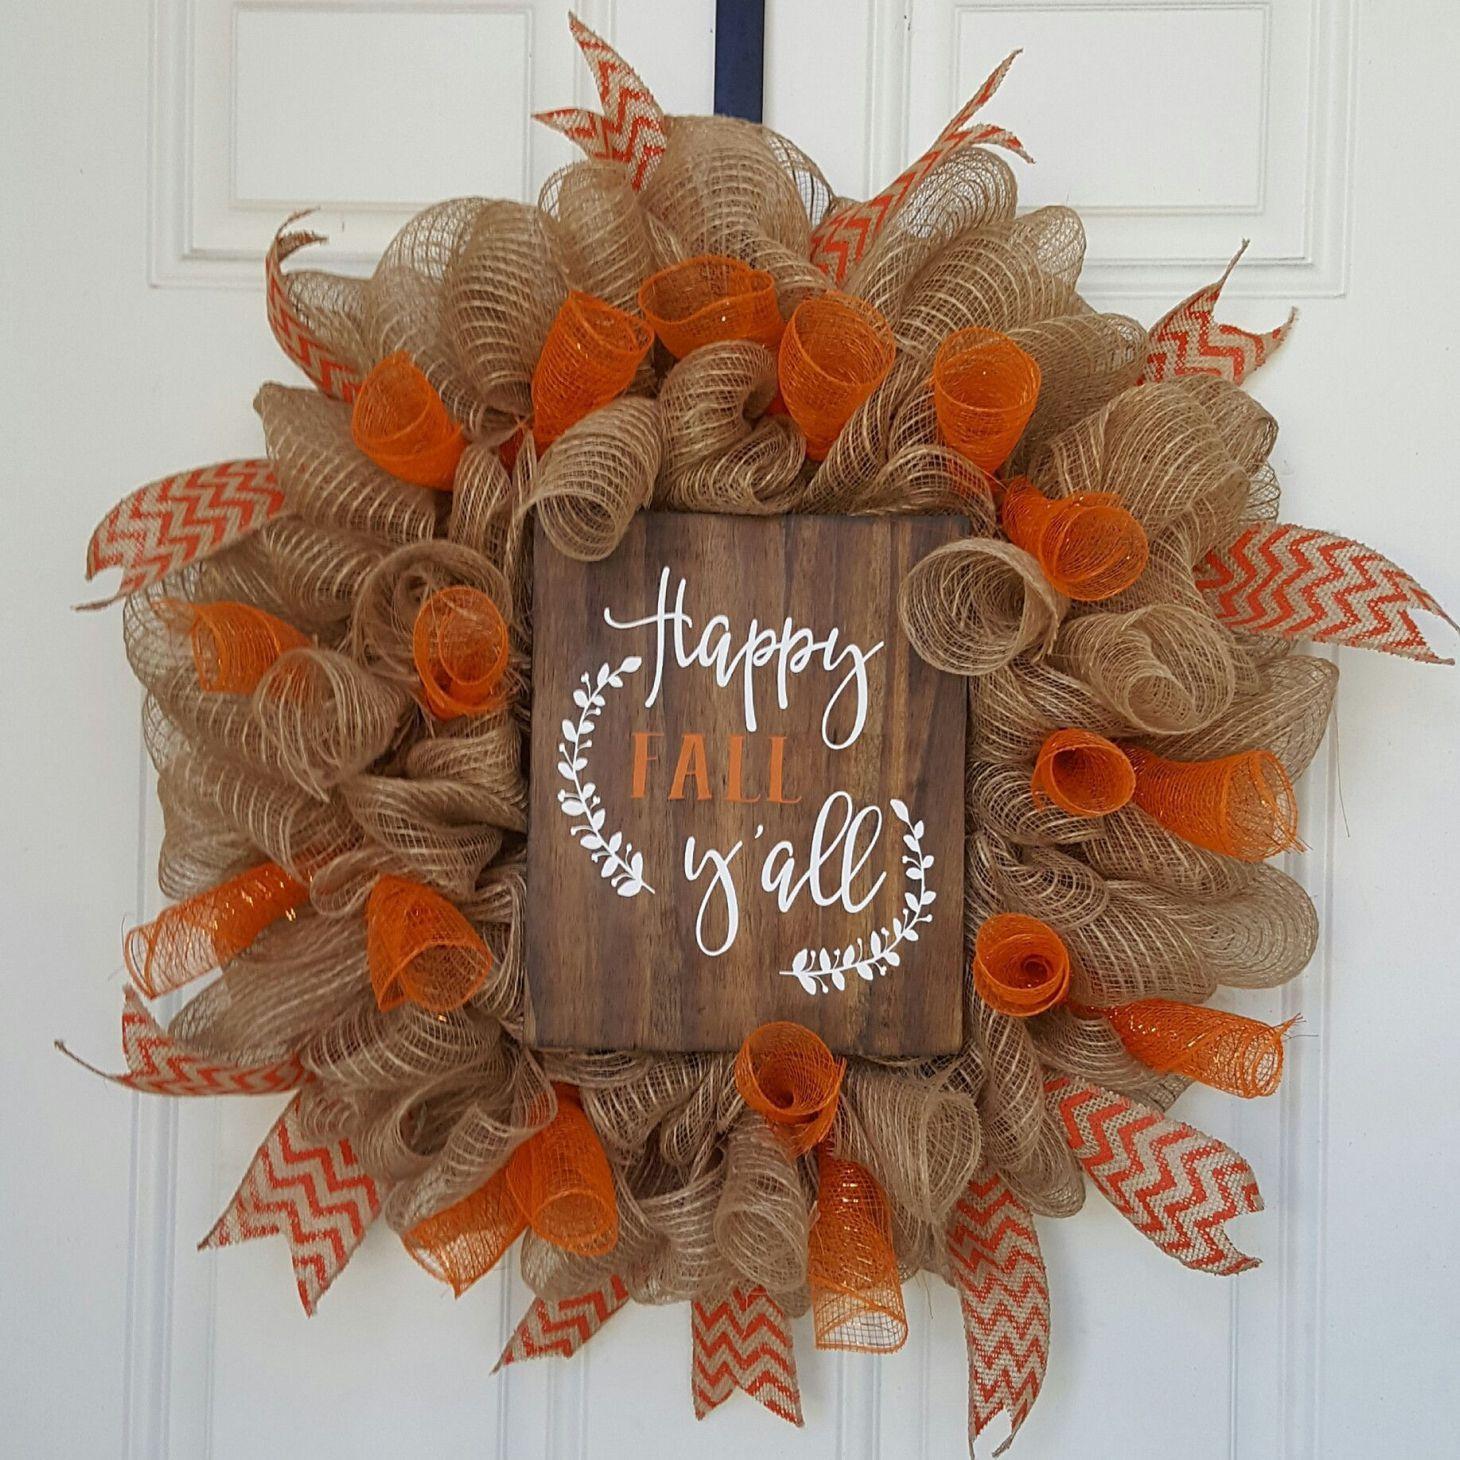 Best Ideas To Create Fall Wreaths Diy 115 Handy Inspirations